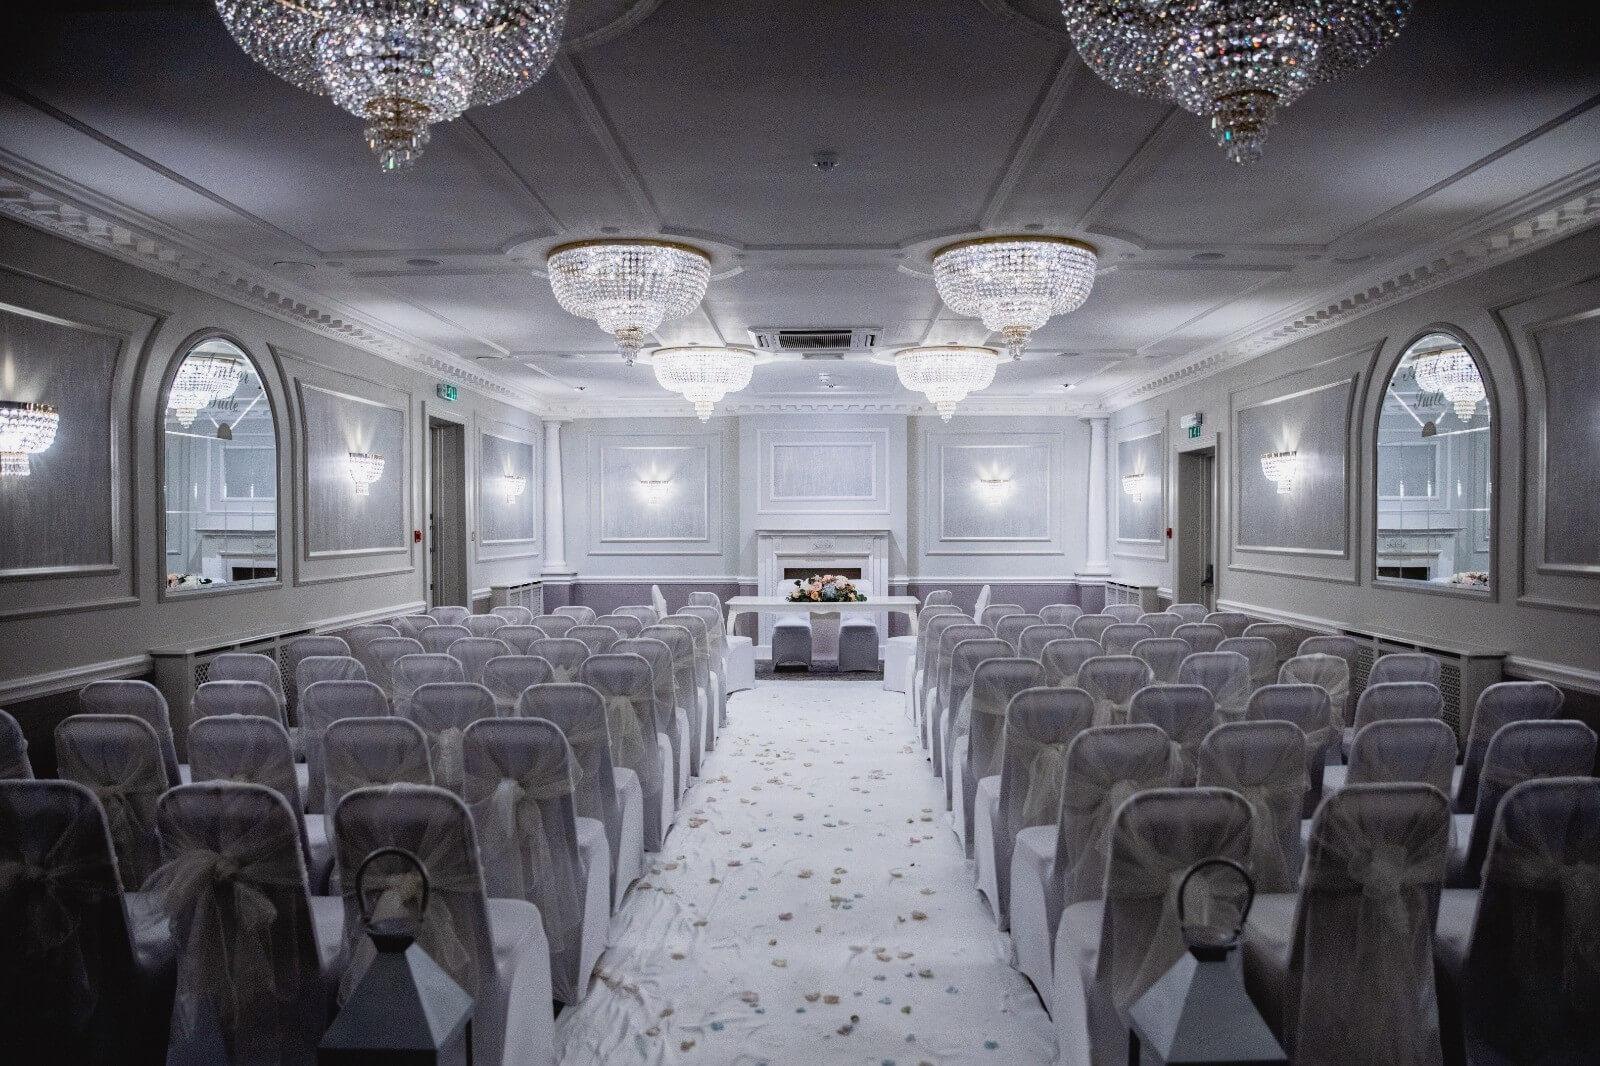 Regency Banqueting Suite Wedding Venues London and Corporate Events Venue